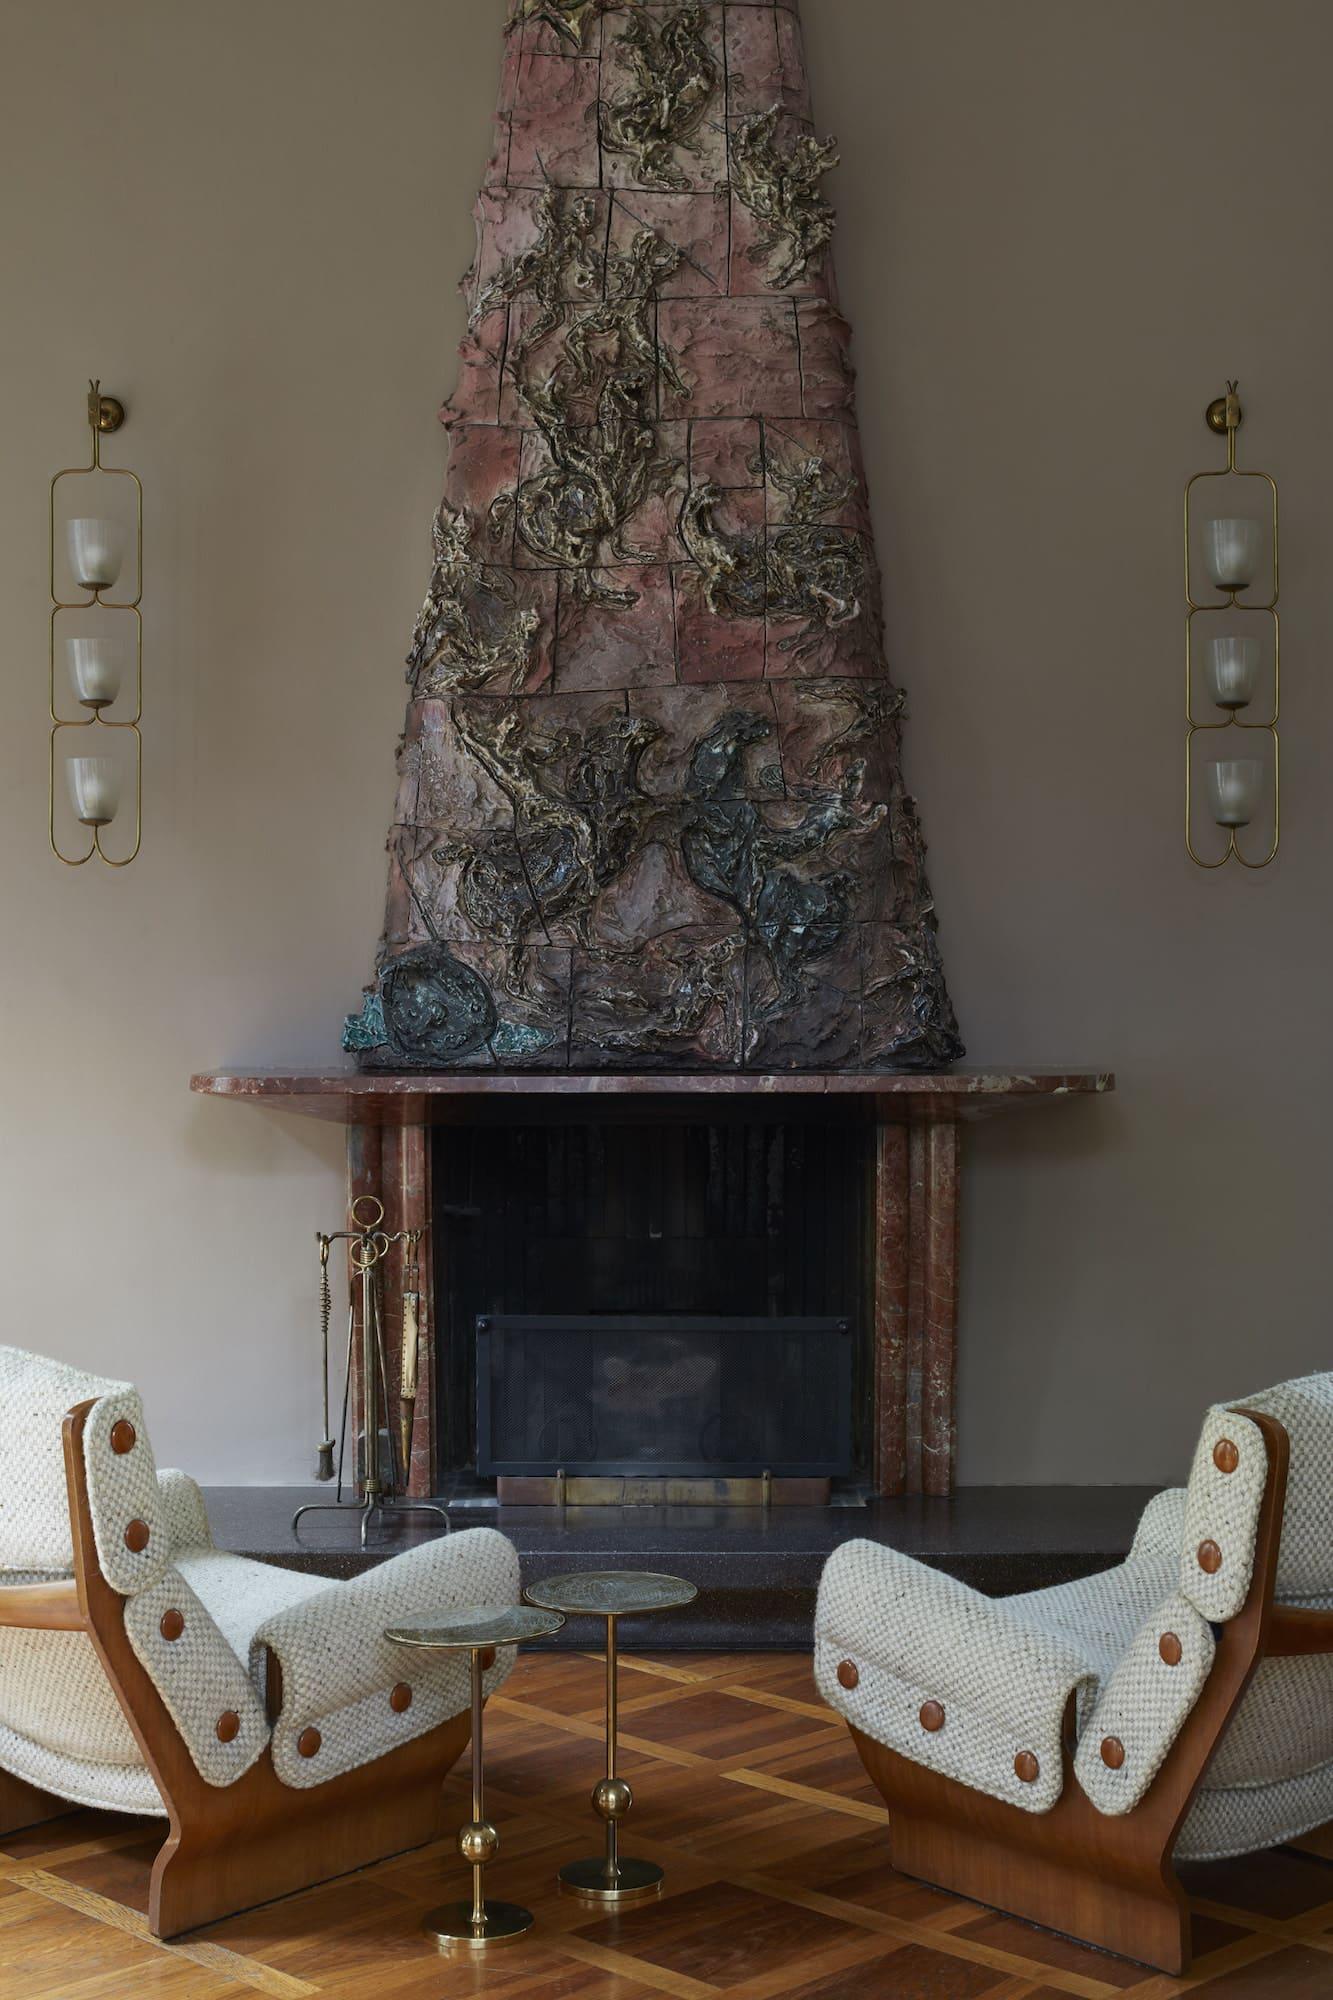 Lucio Fontana's fireplace in the living room of Villa Borsani